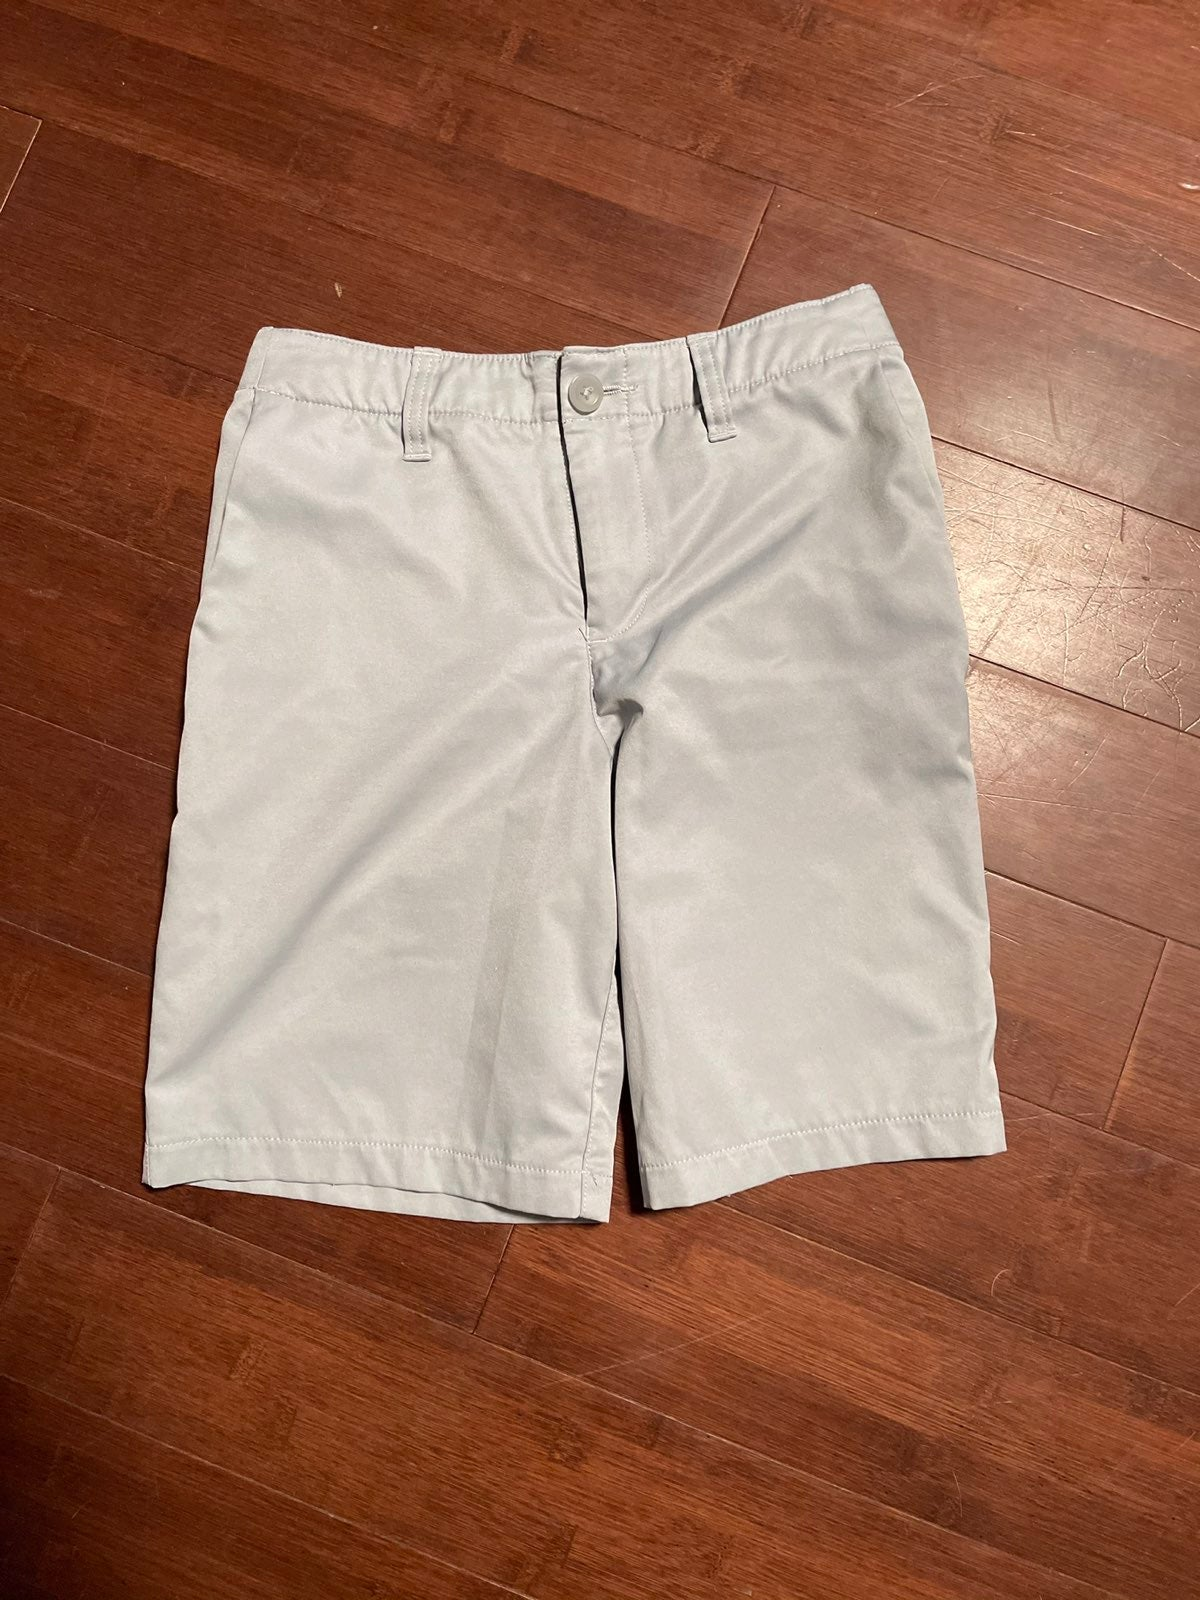 Under Armour grey shorts 12